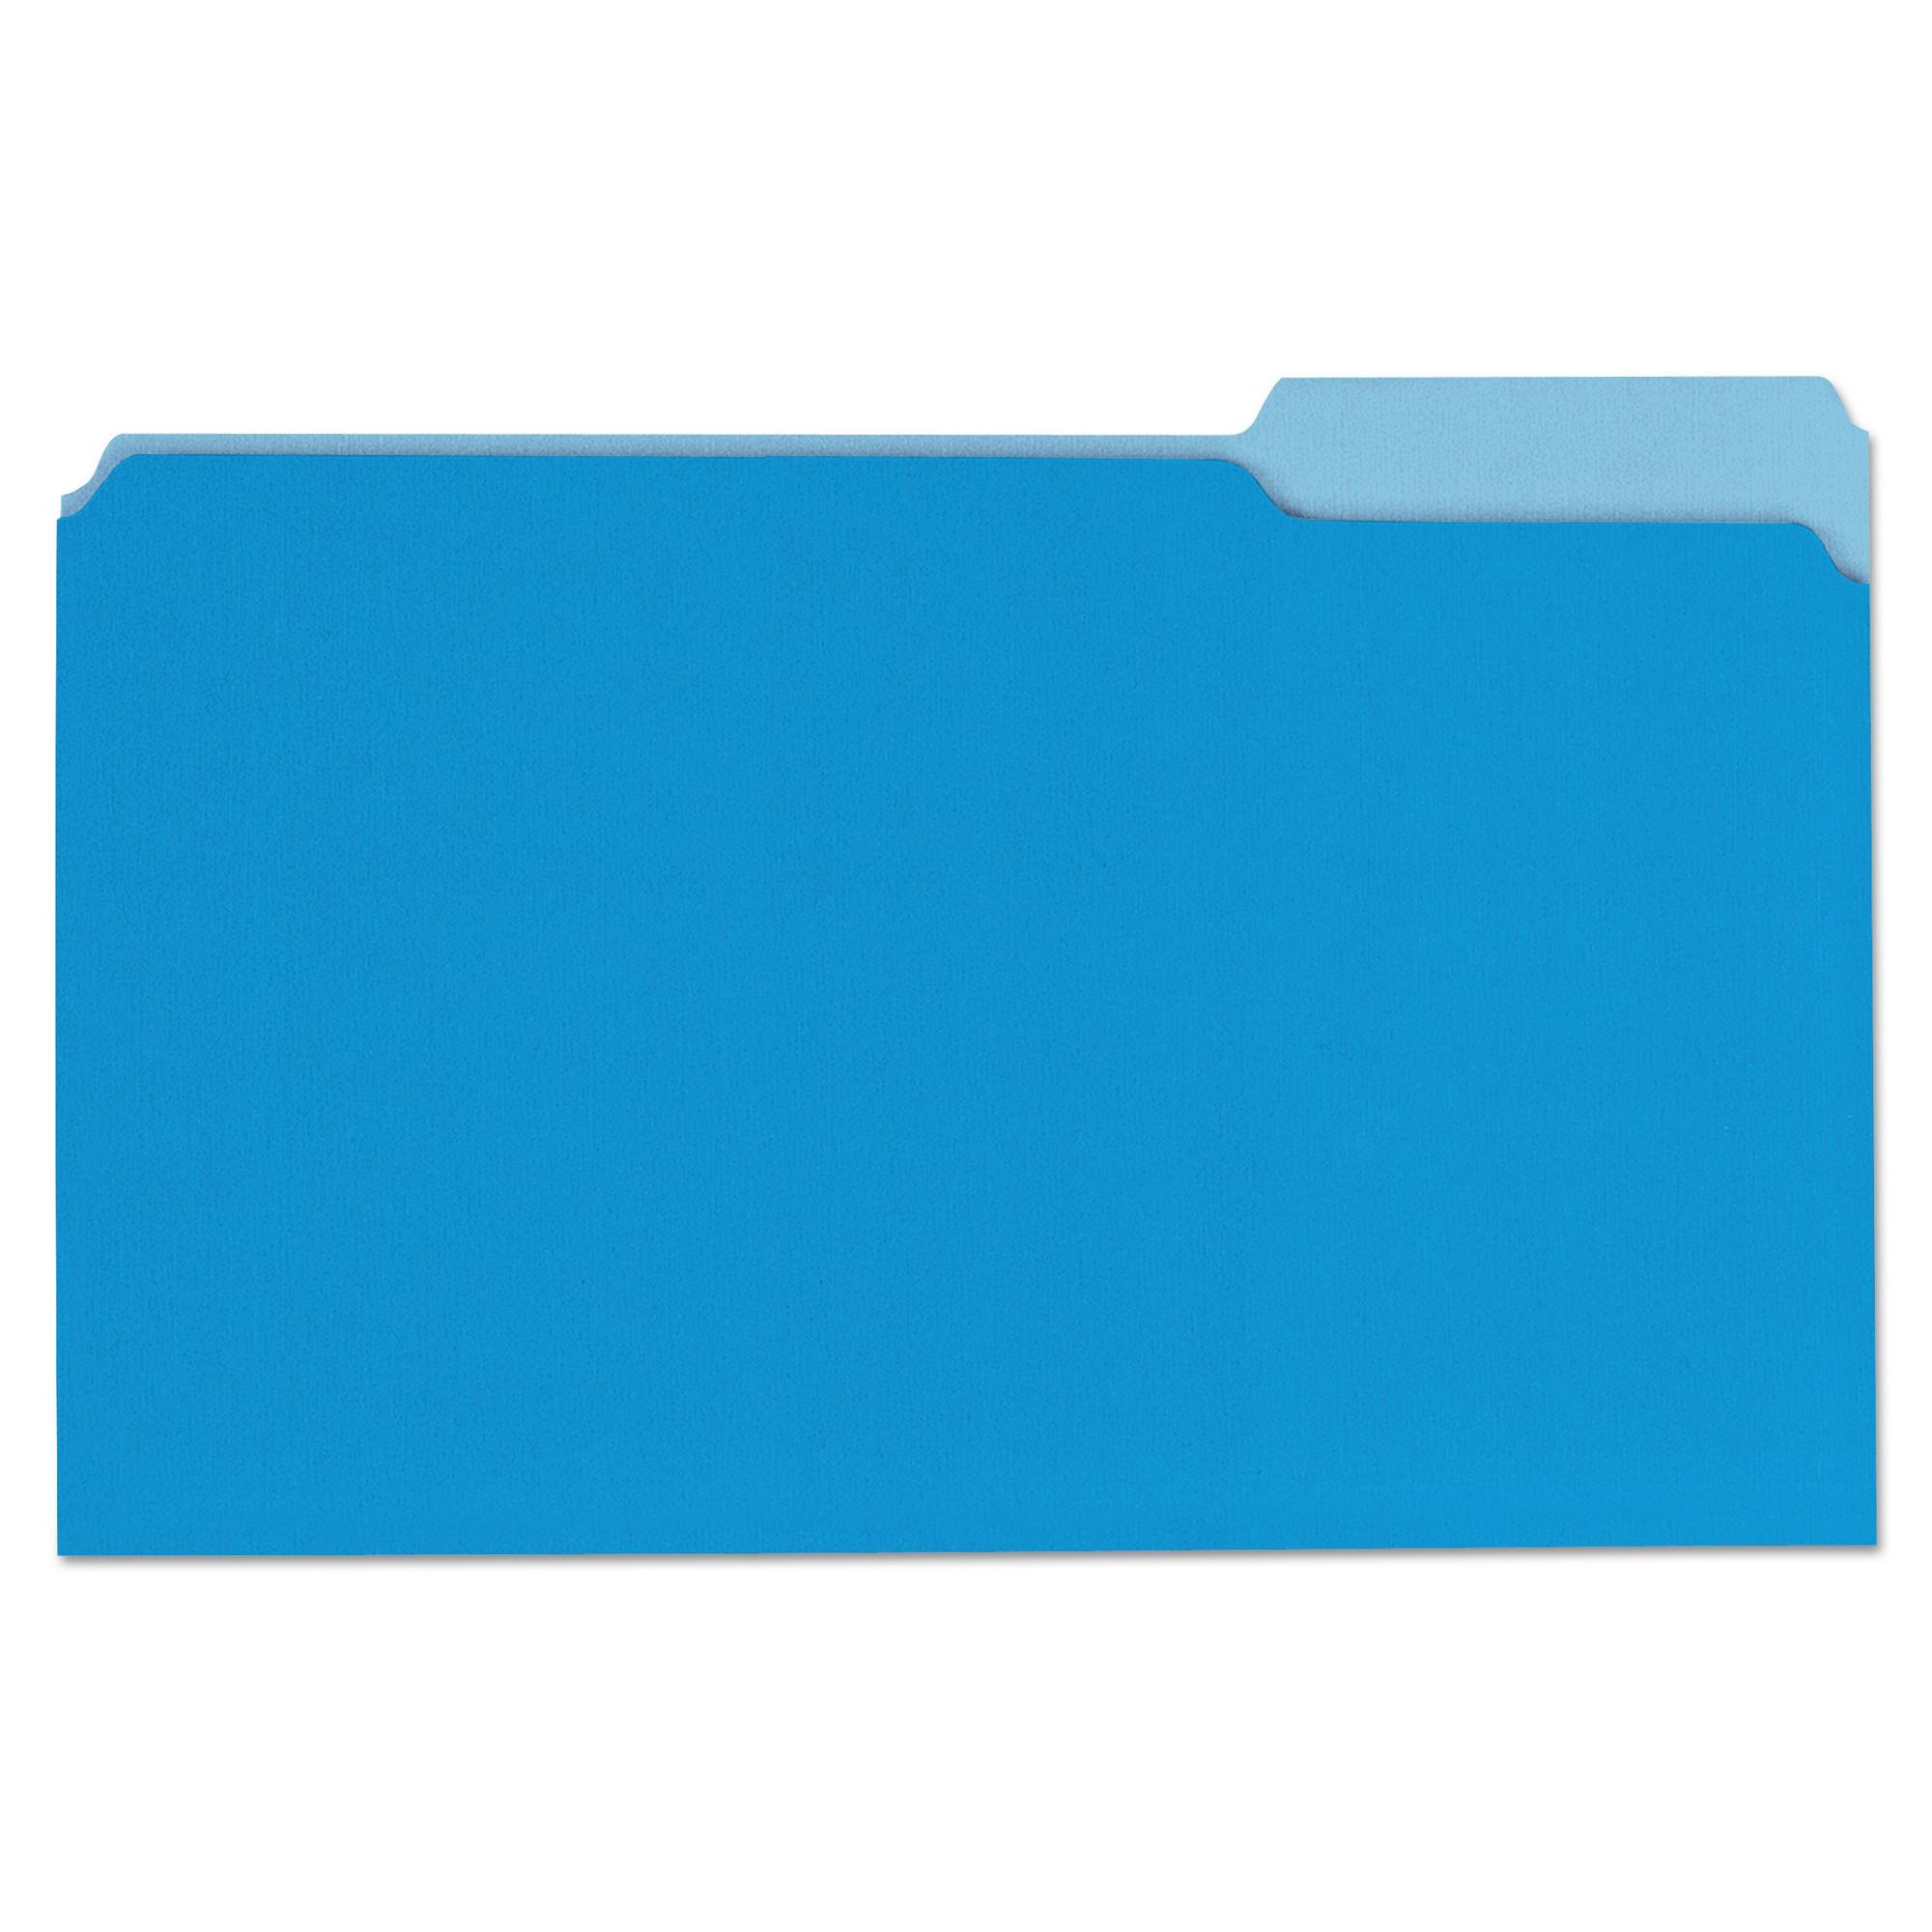 File Folders, 1/3 Cut One-Ply Top Tab, Legal, Blue/Light Blue, 100/Box